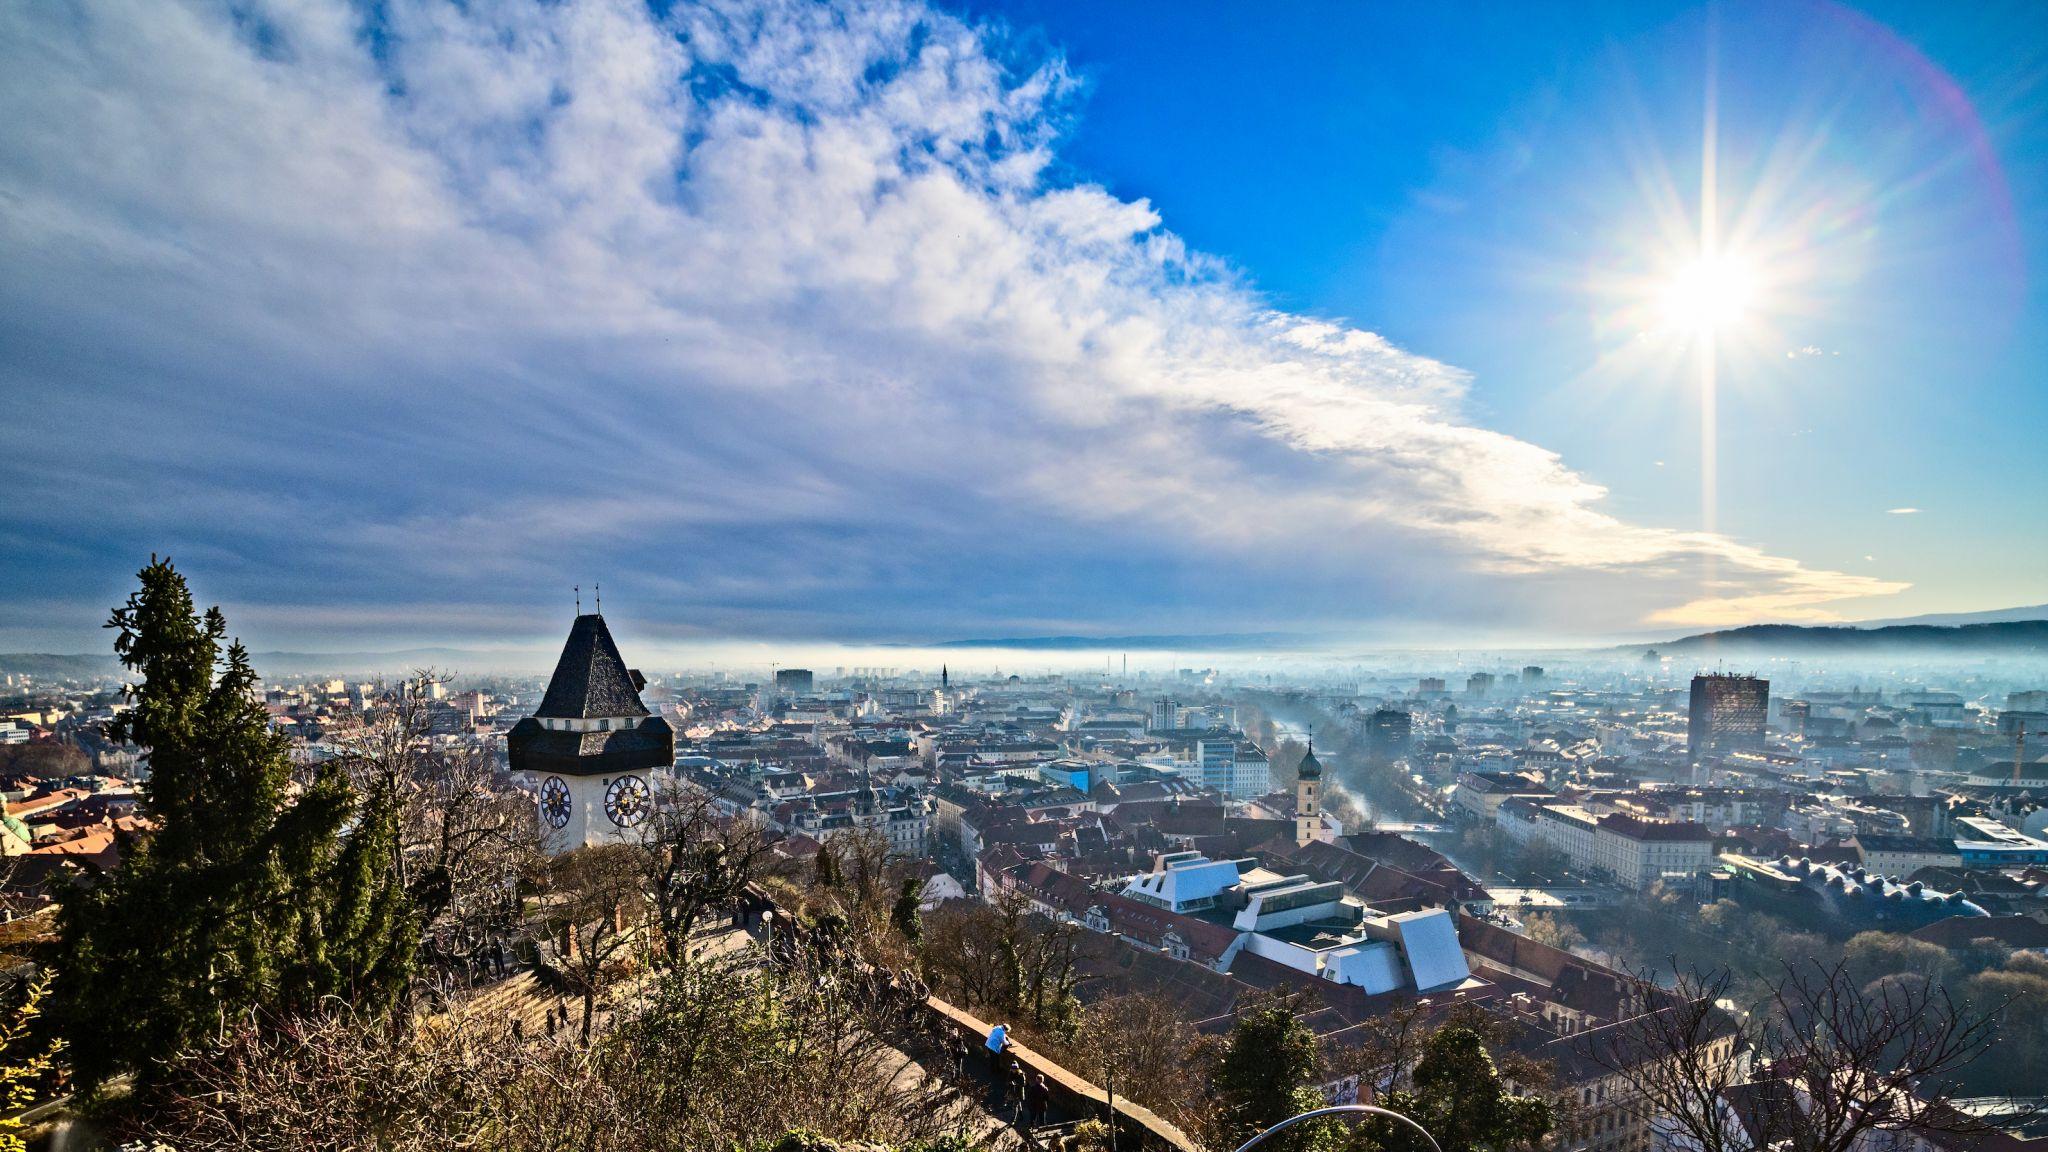 Graz, Schlossberg, Uhrturm, Austria